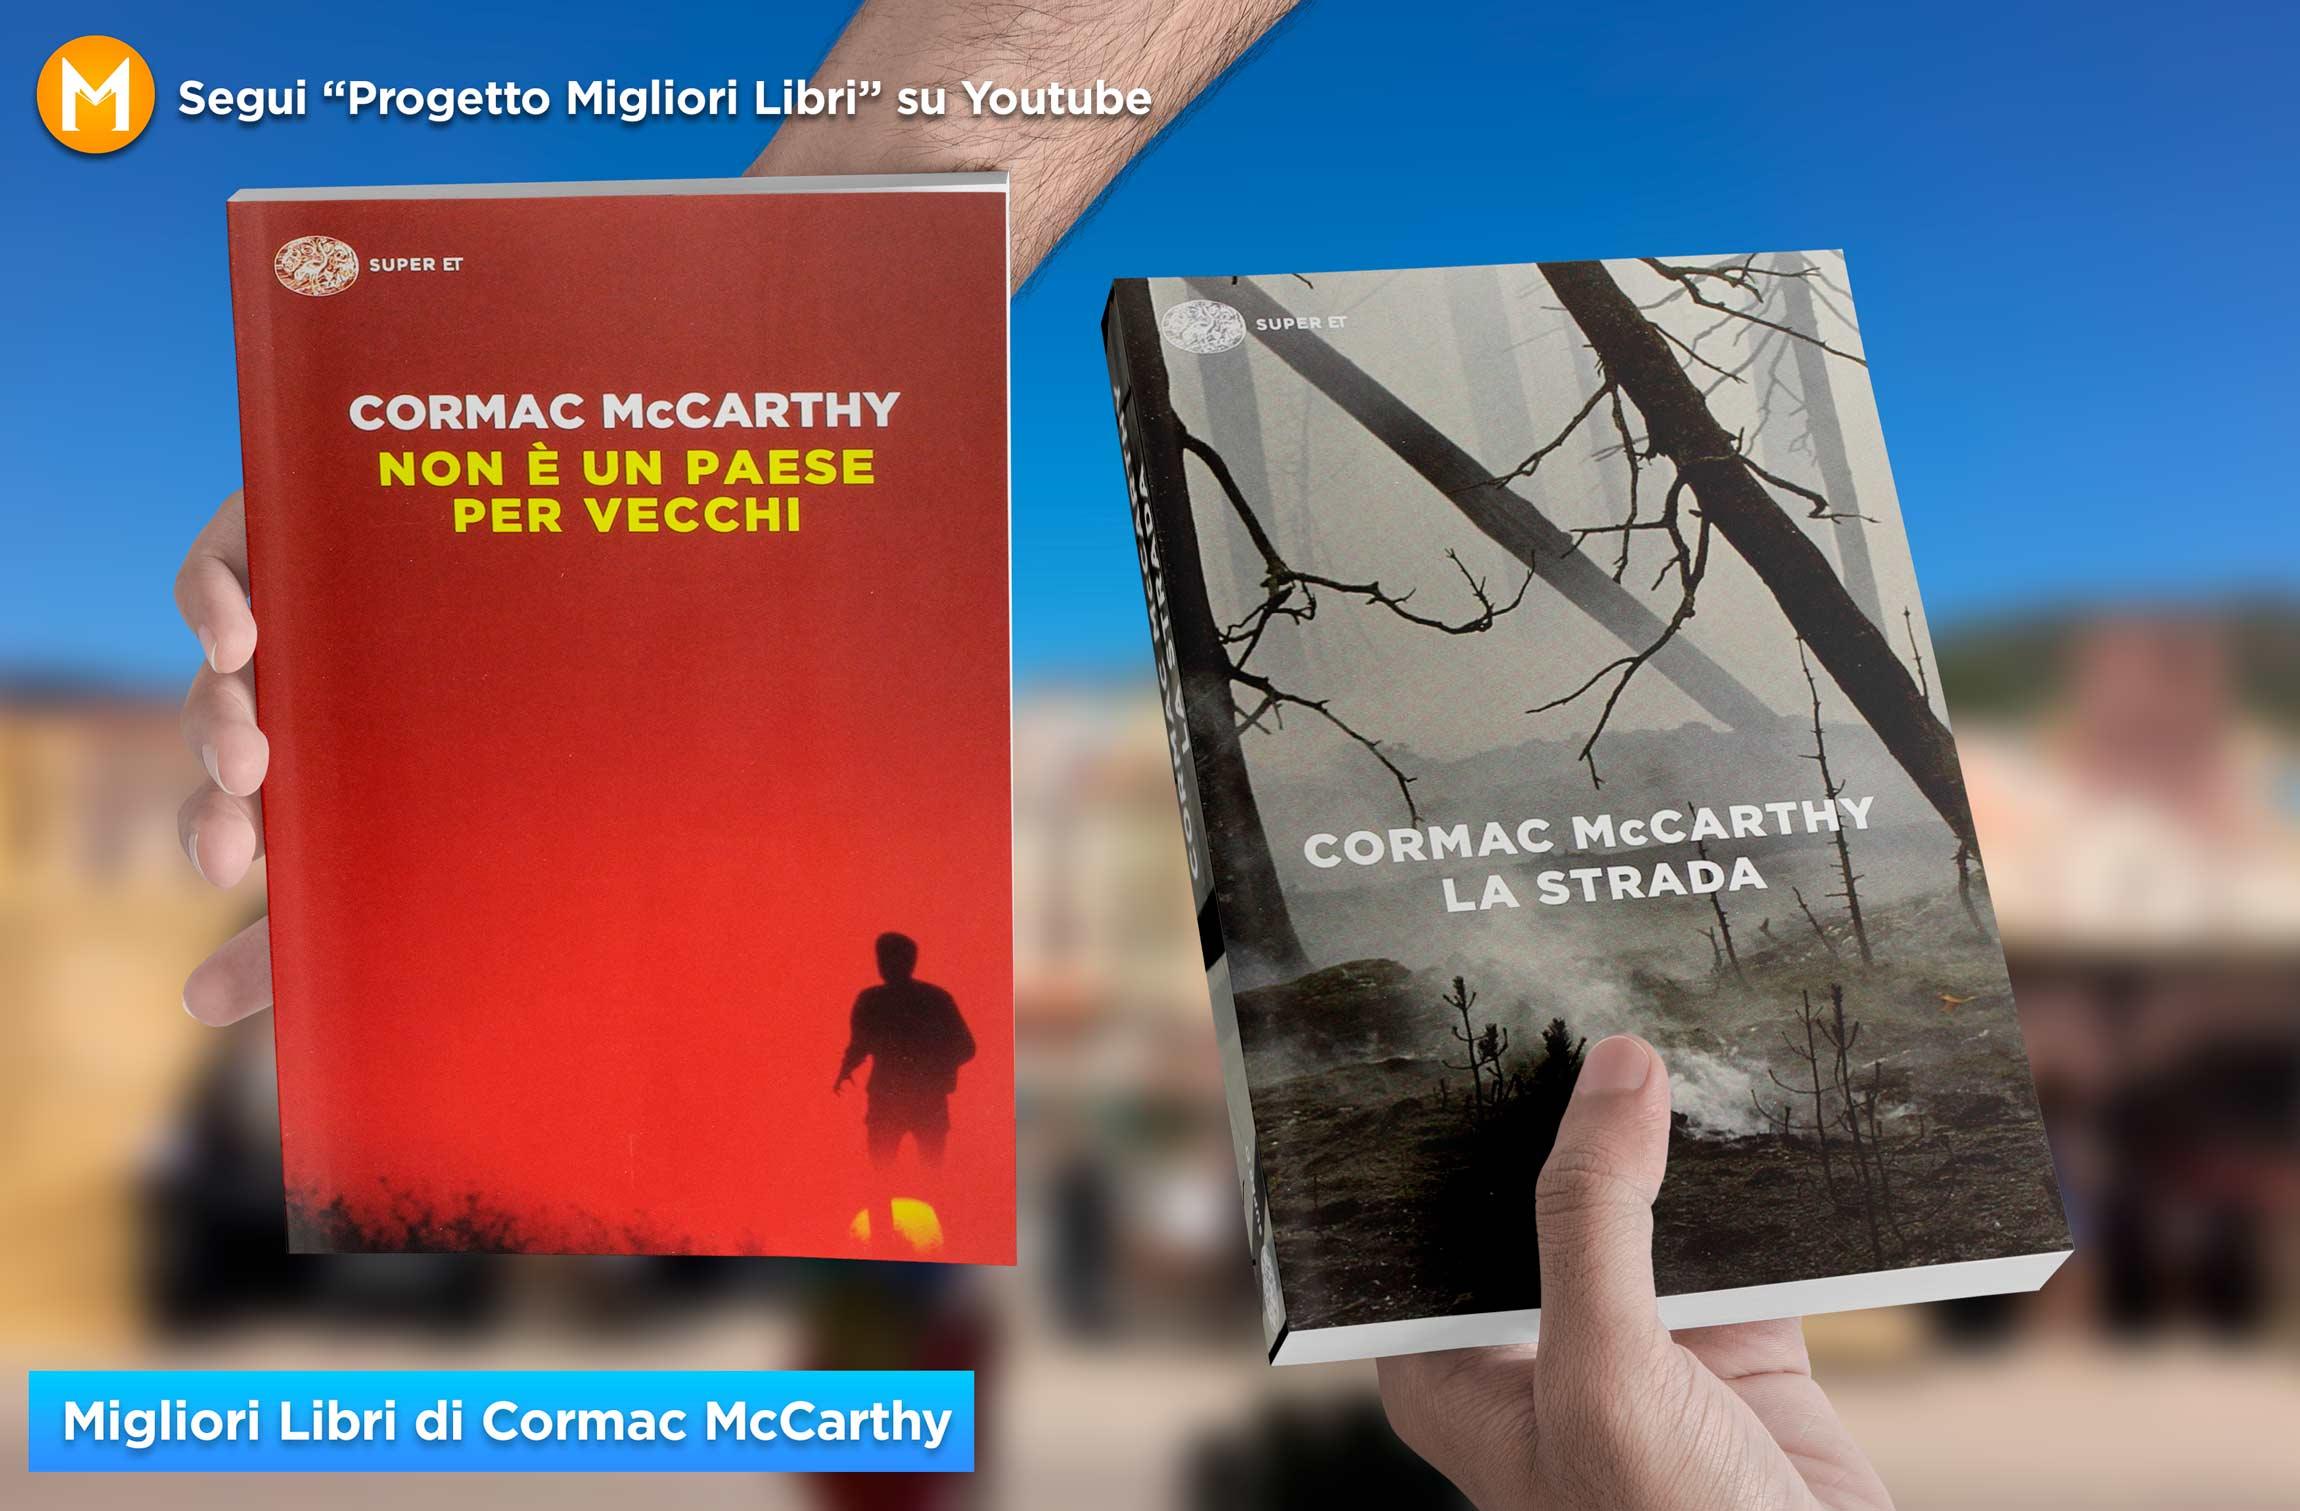 migliori-libri-cormac-mccarthy